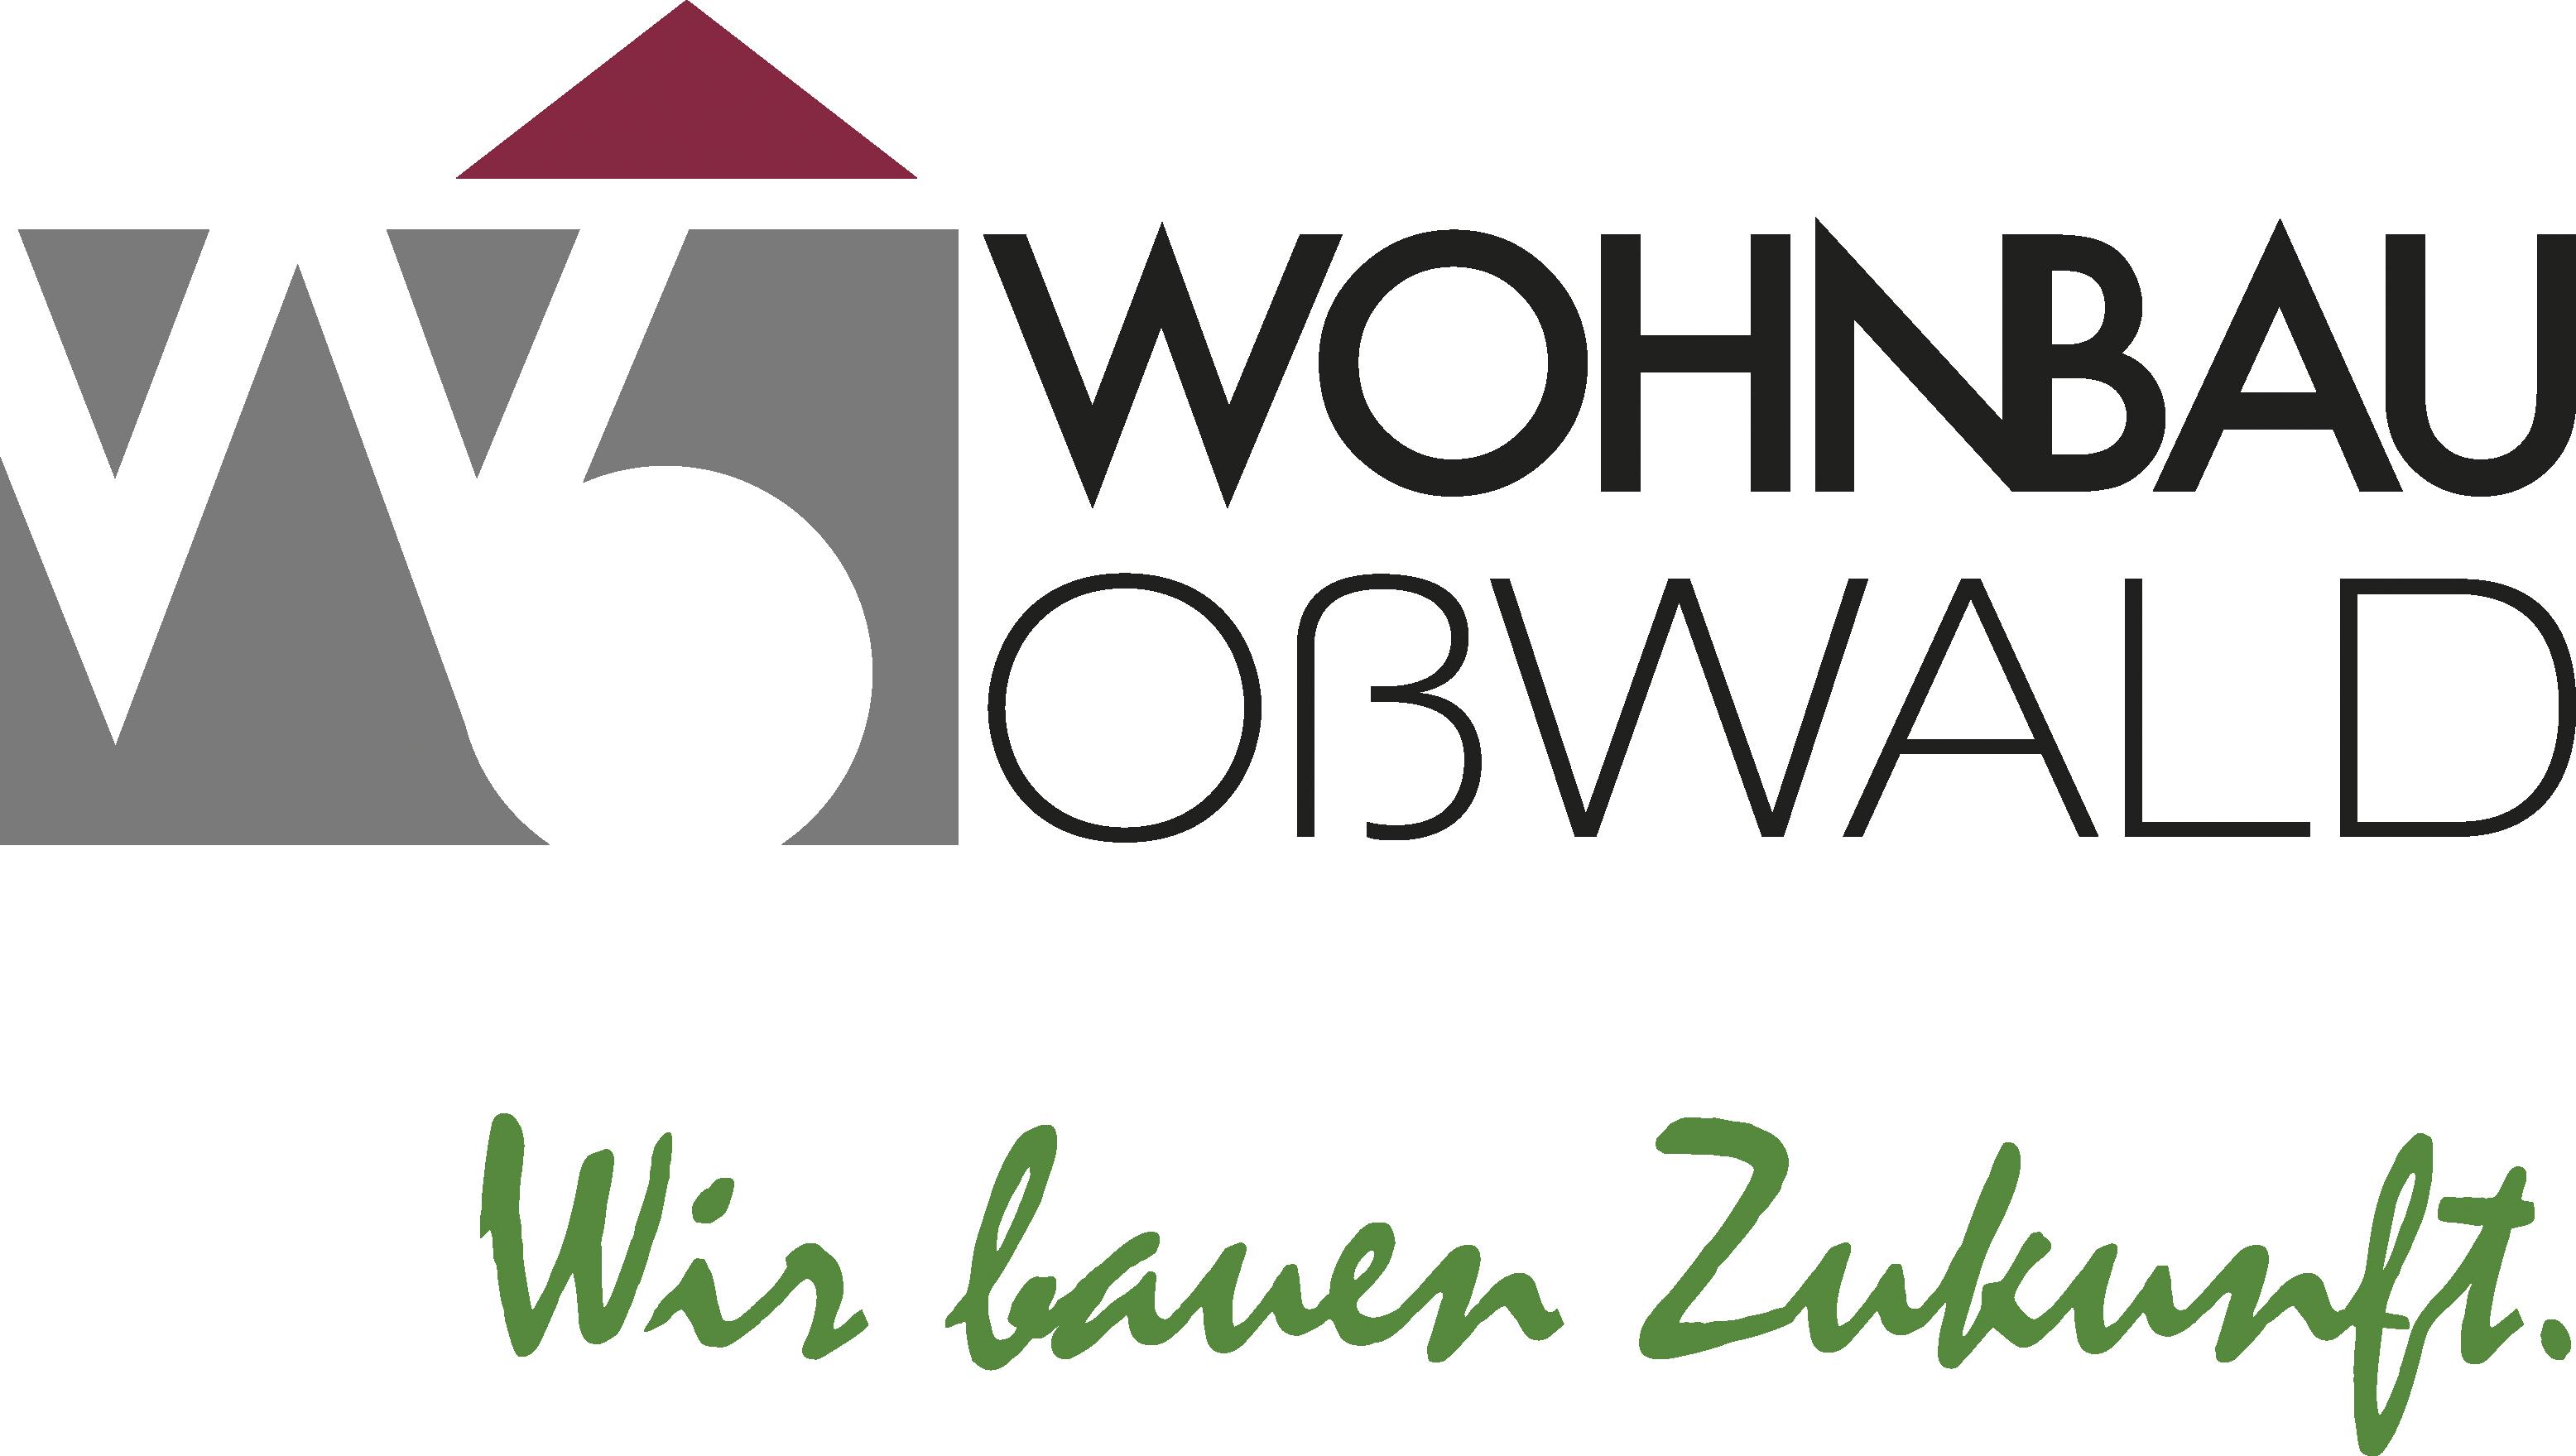 Wohnbau Oßwald GmbH